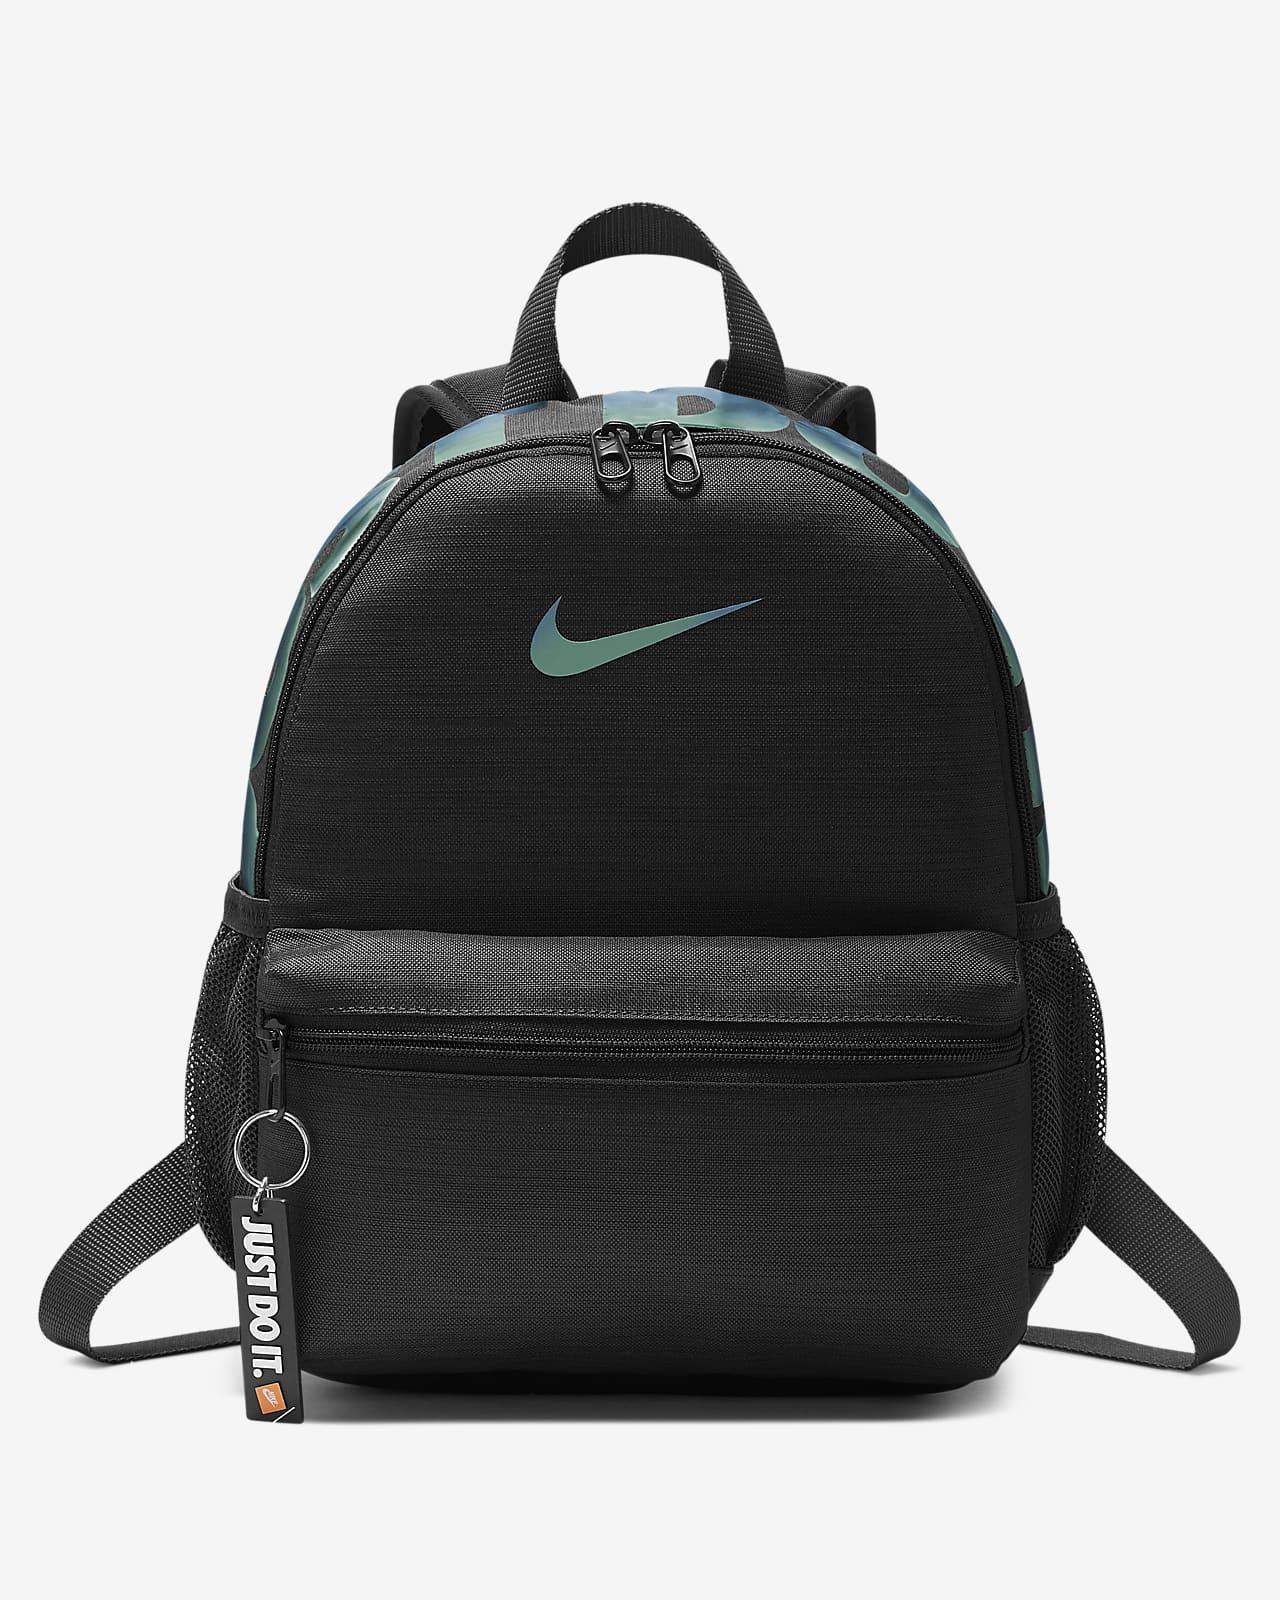 Sac à dos Nike Brasilia JDI pour Enfant (Mini)